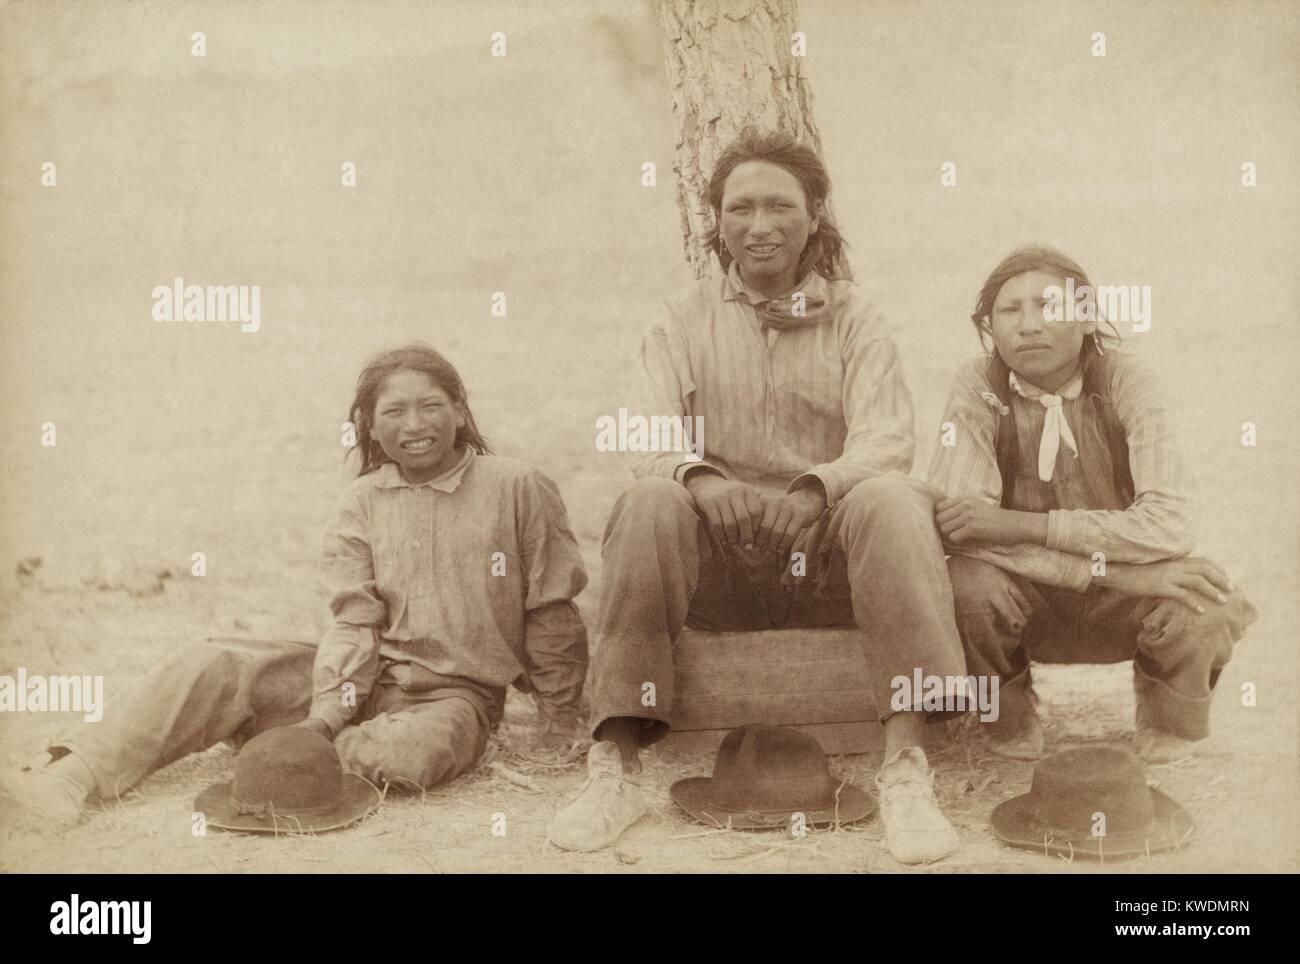 Three Lakota teenage boys in western clothing, photographed following the Wounded Knee Massacre. The derogatory - Stock Image